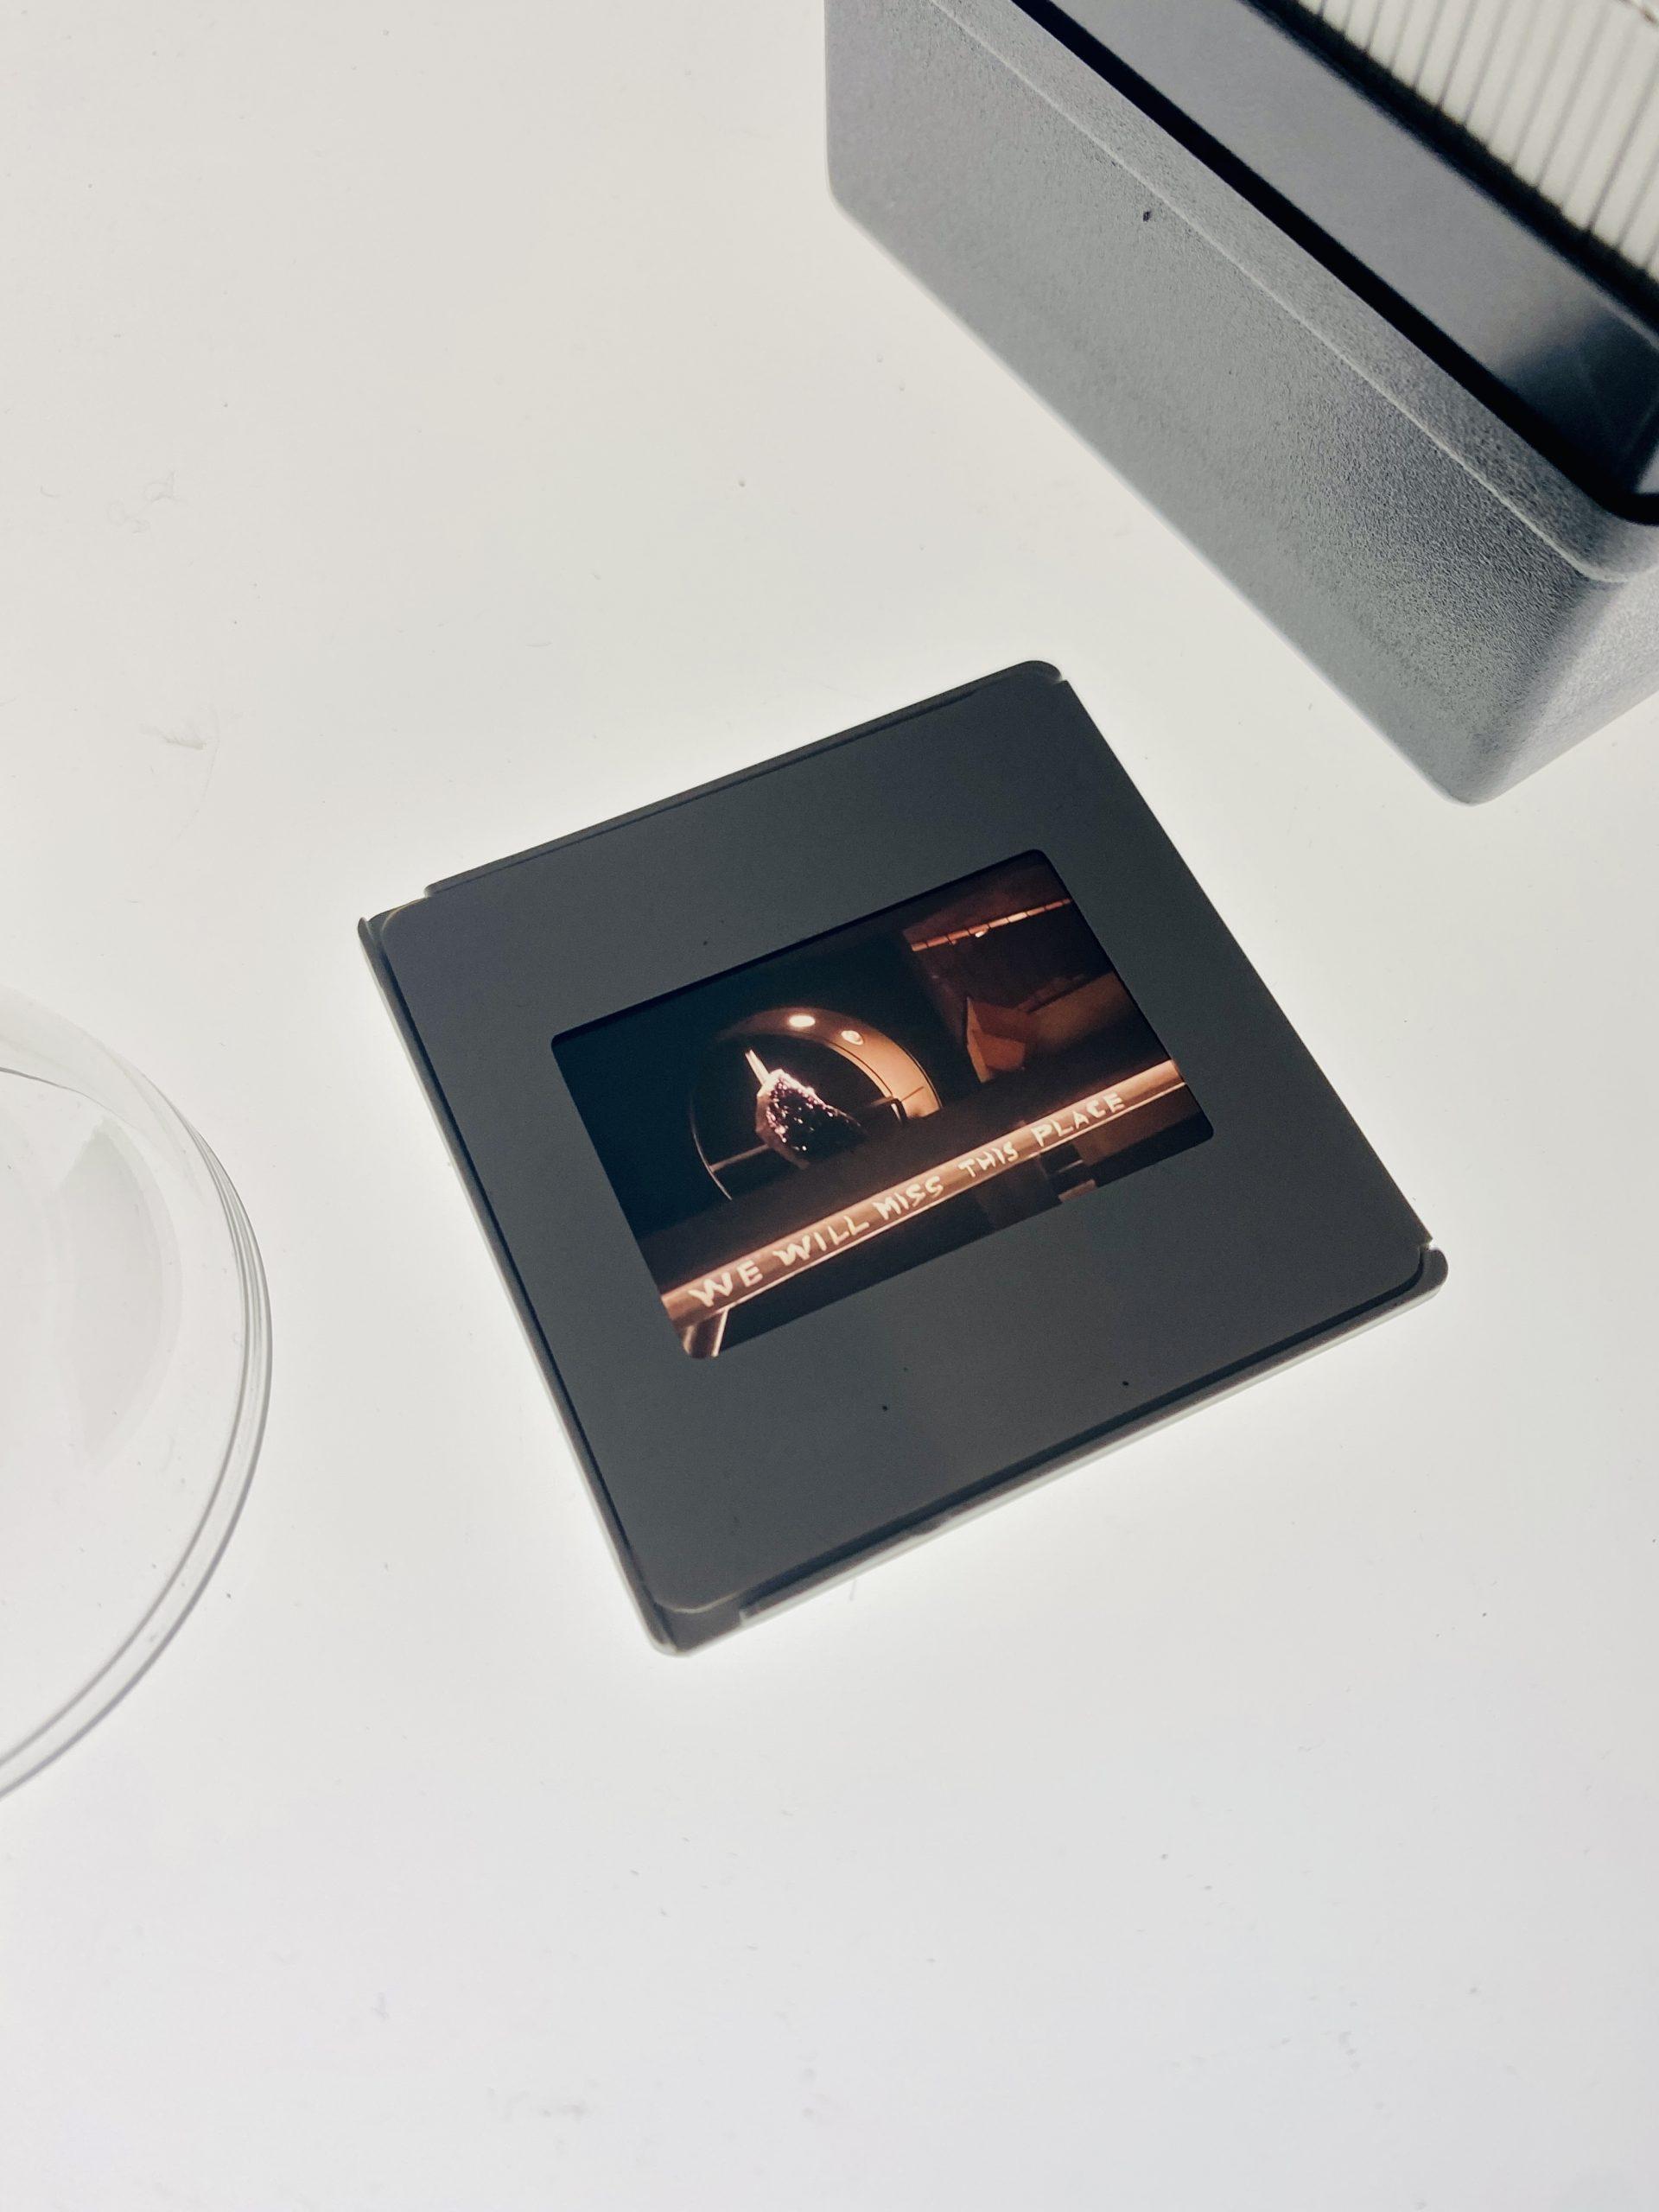 archivo digitales a diapositivas